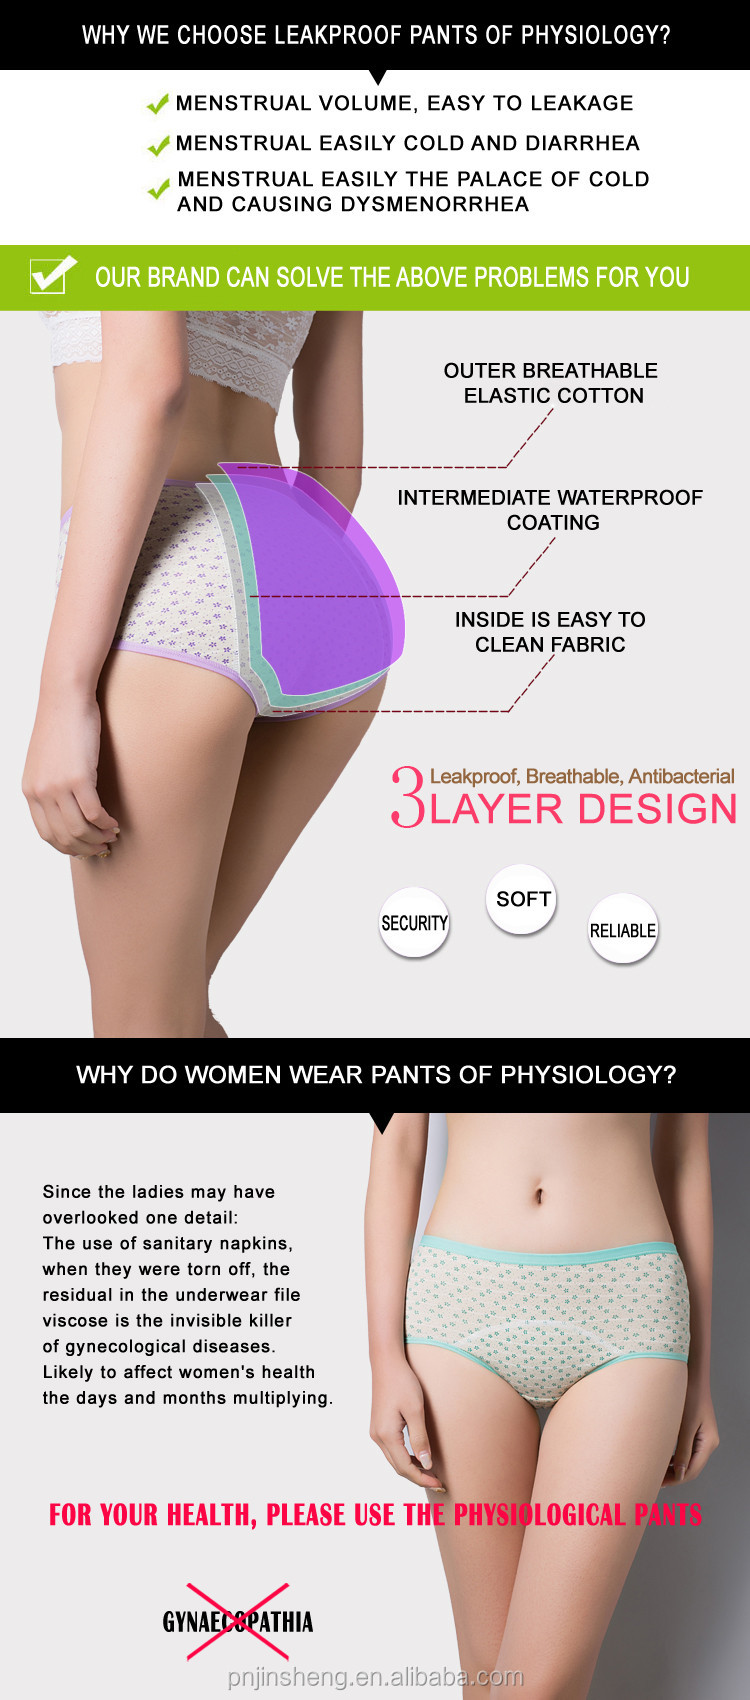 Young Girl Intimates Physiological Panties Menstrual Modal ...